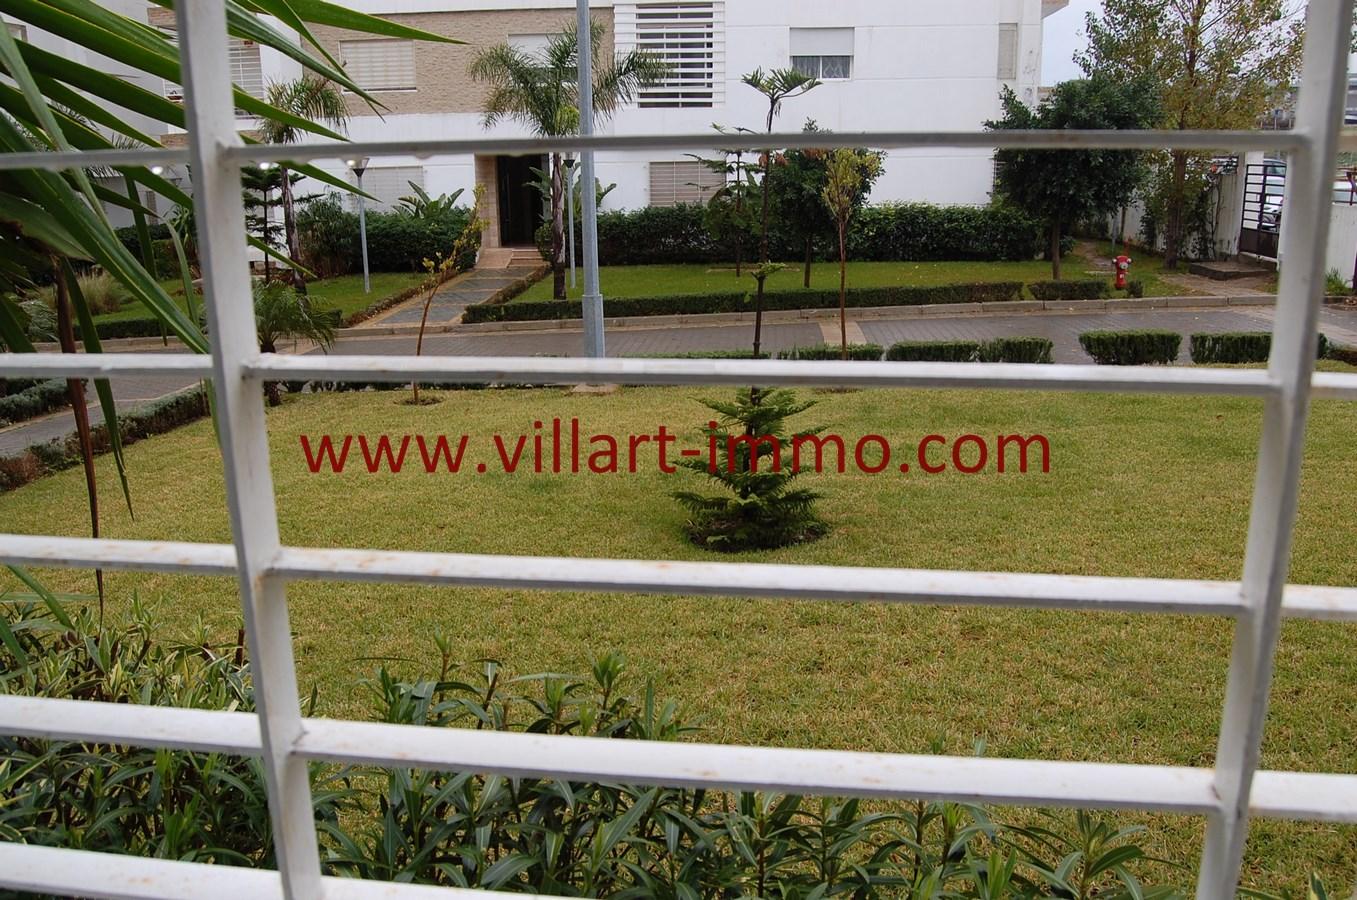 1-Vente-Appartement-Tanger-Route-de-Rabat-Vue-VA474-Villart Immo